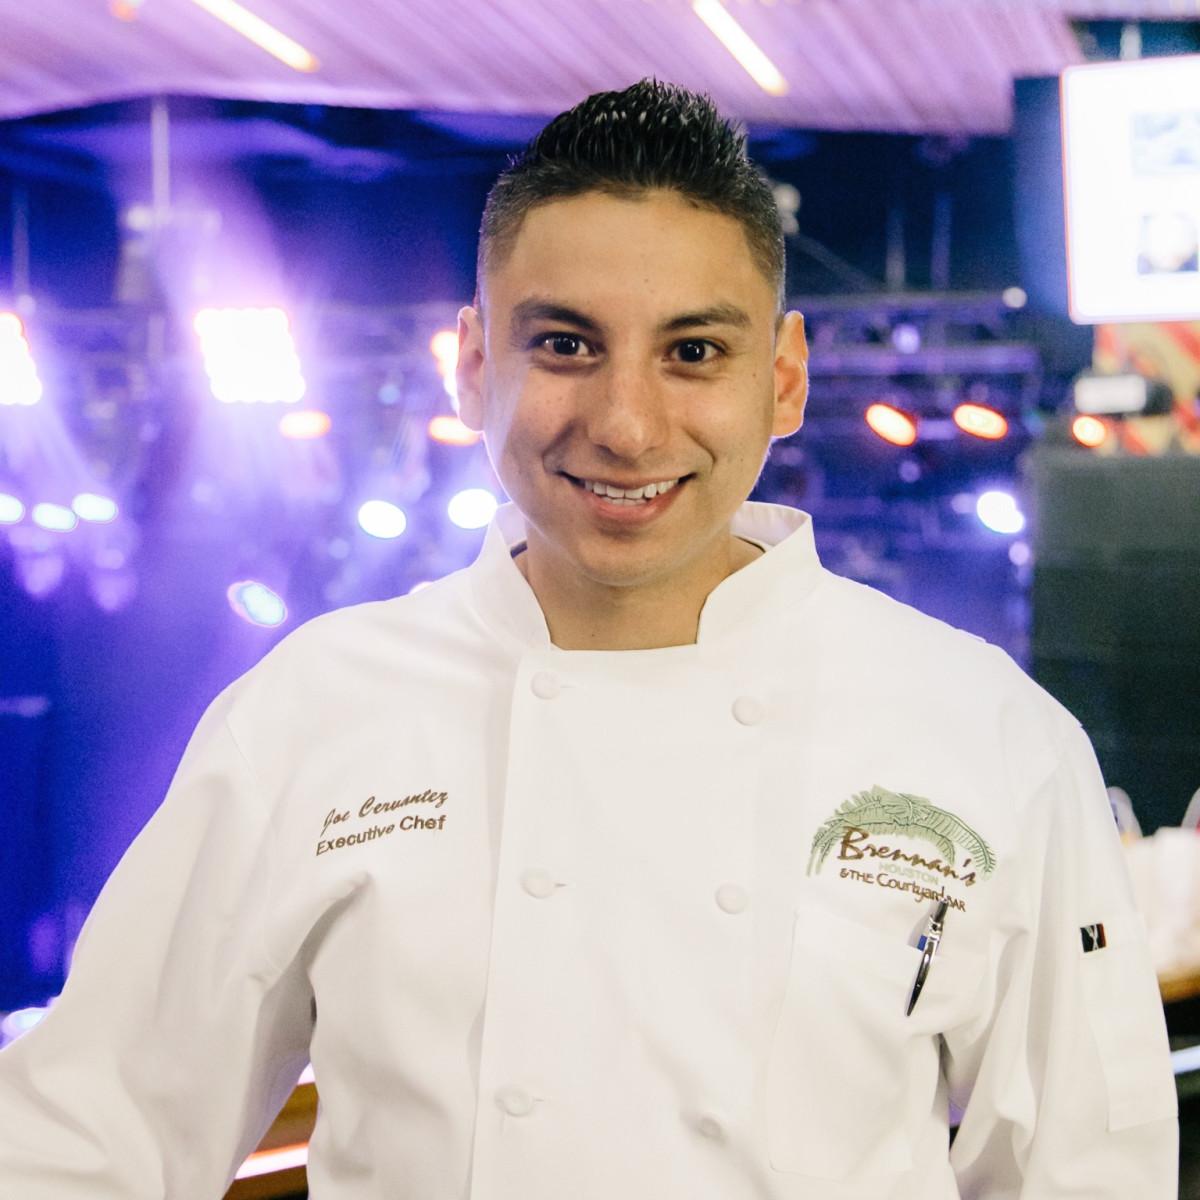 Camp for All Culinary Challenge Joe Cervantez Brennan's